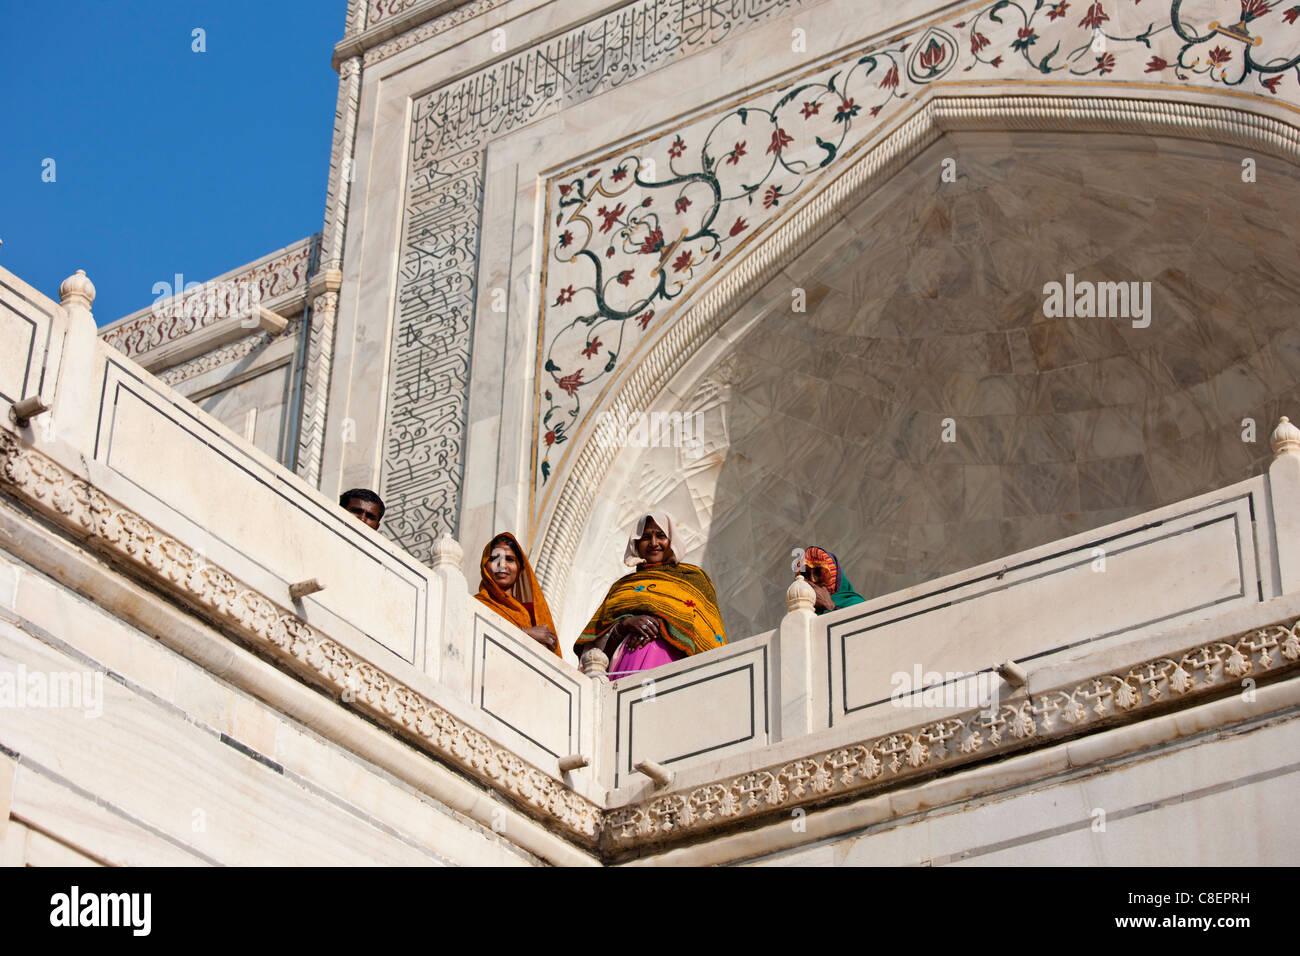 Indische Touristen am Taj Mahal-Mausoleum, Uttar Pradesh, Indien Stockbild